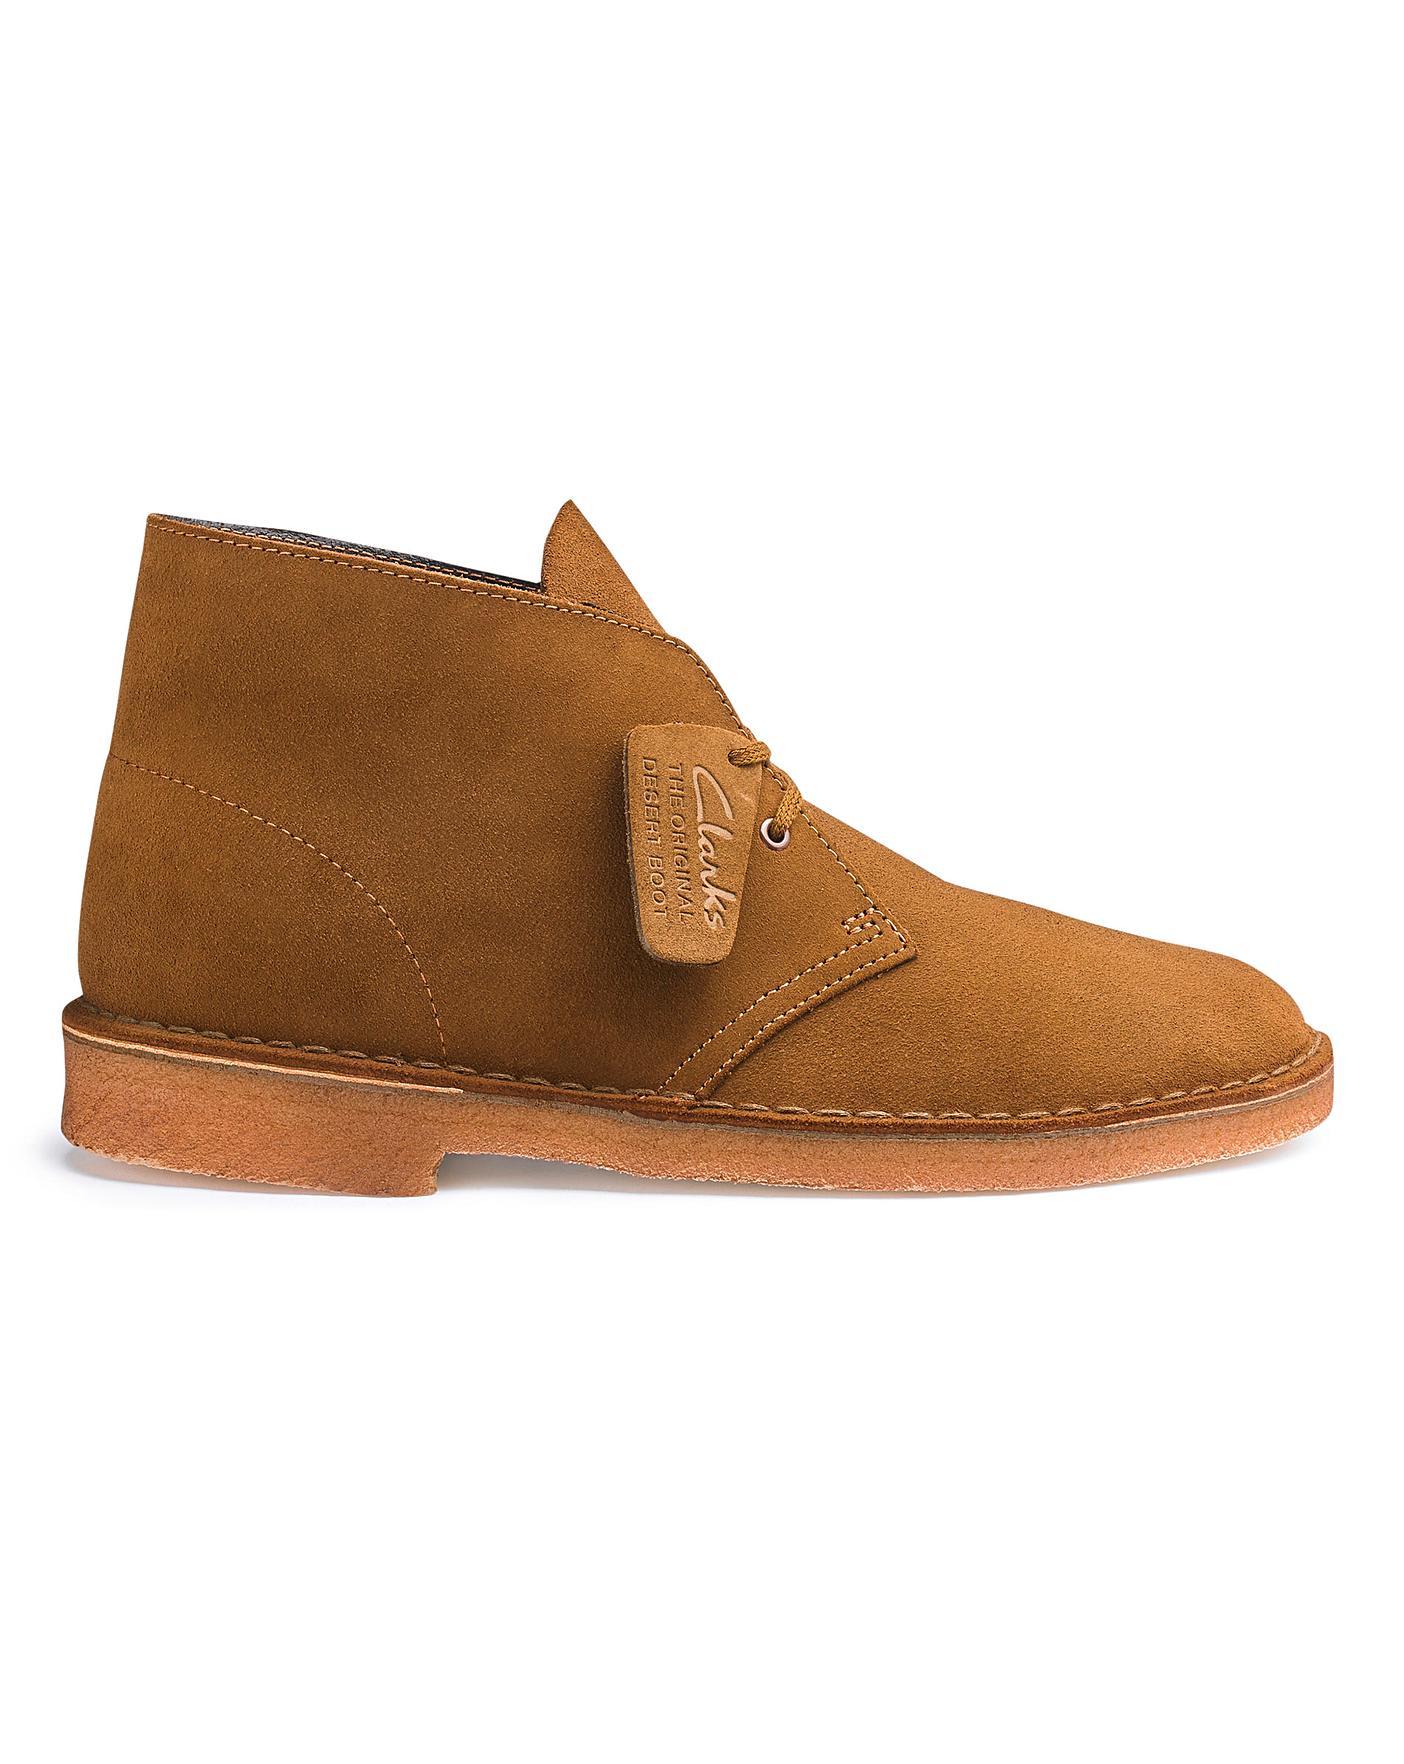 8dab8361 Clarks Originals Suede Desert Boots